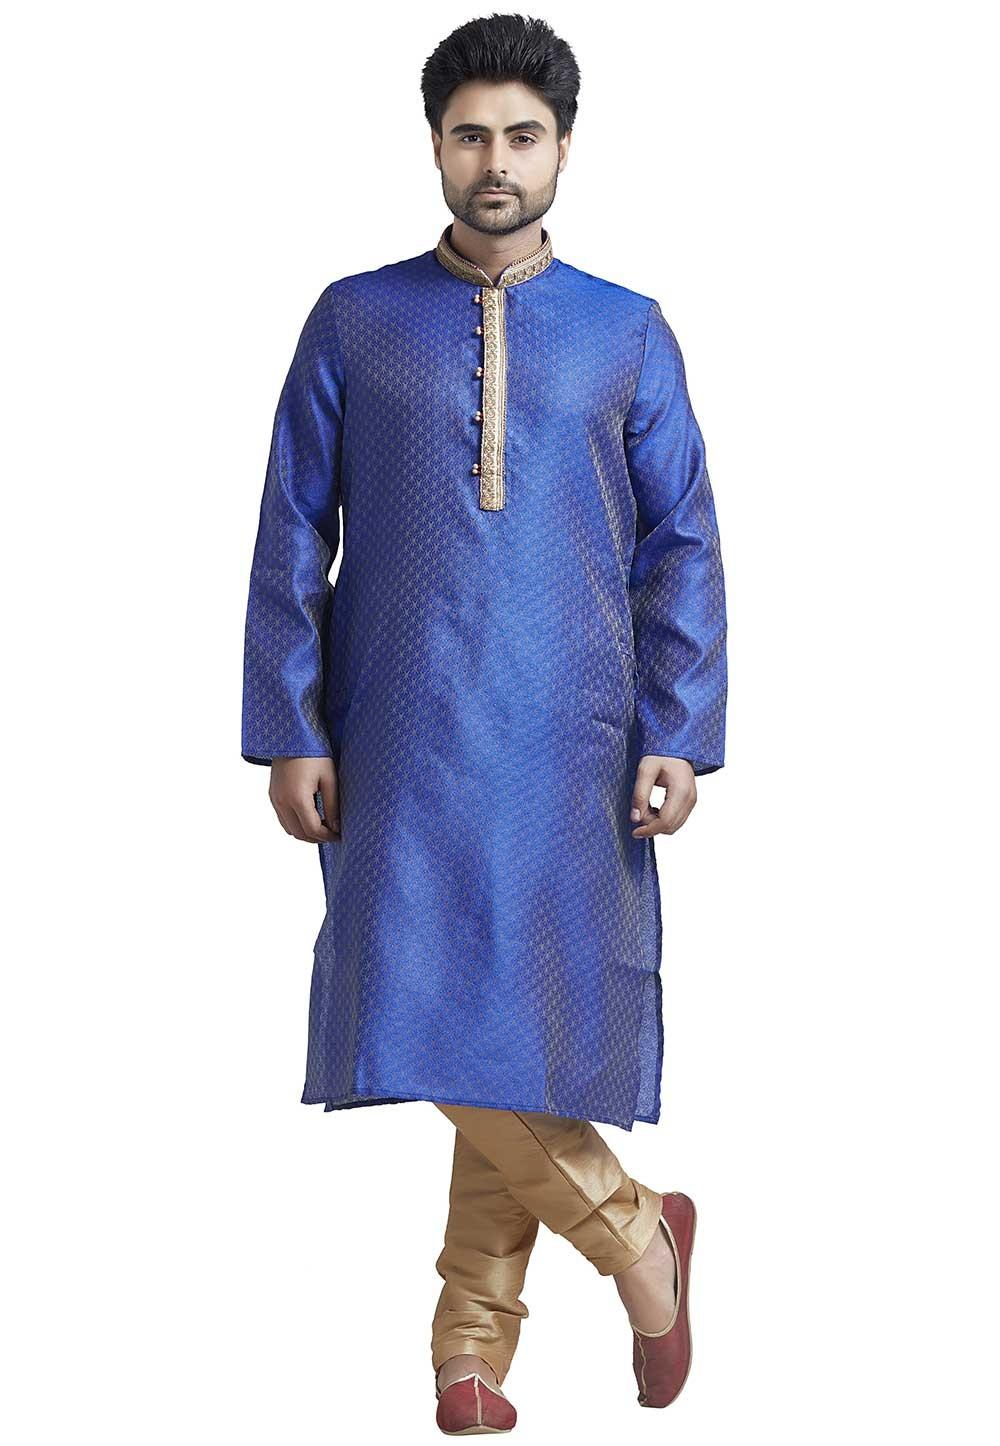 Designer: Buy Kurta Pajama Online in Blue Colour